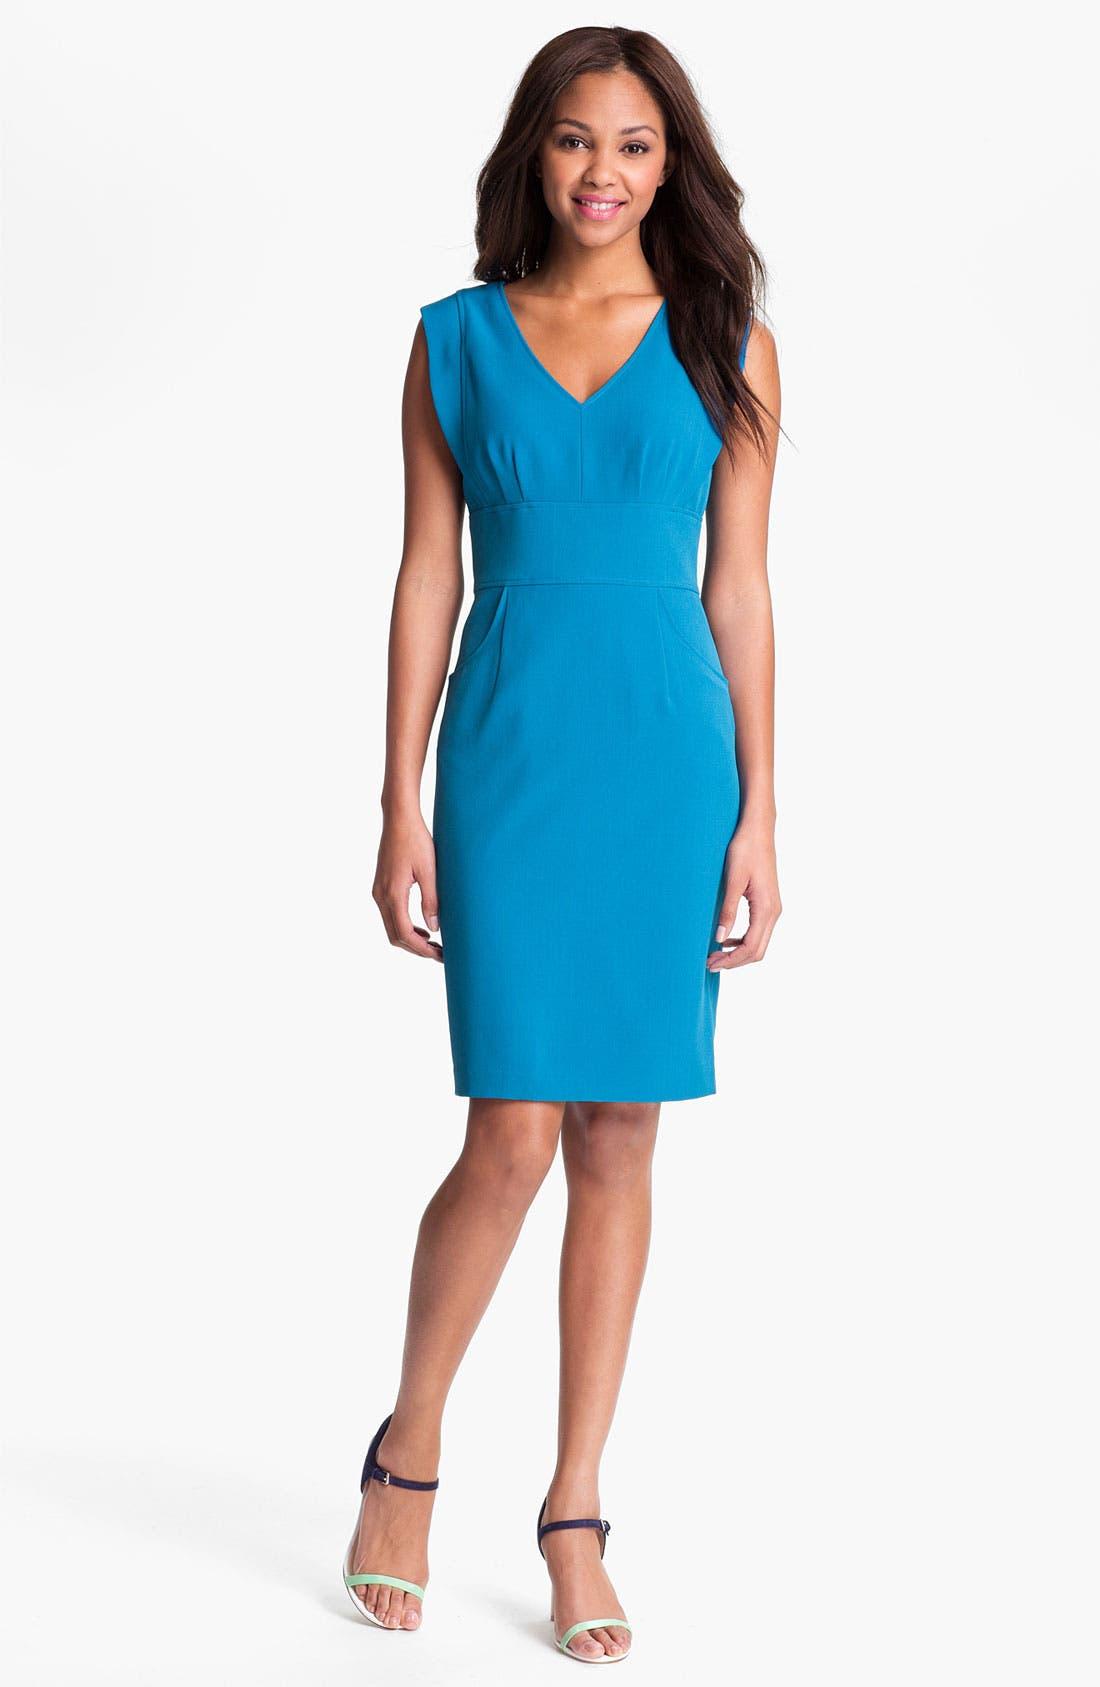 Alternate Image 1 Selected - Adrianna Papell V-Neck Sheath Dress